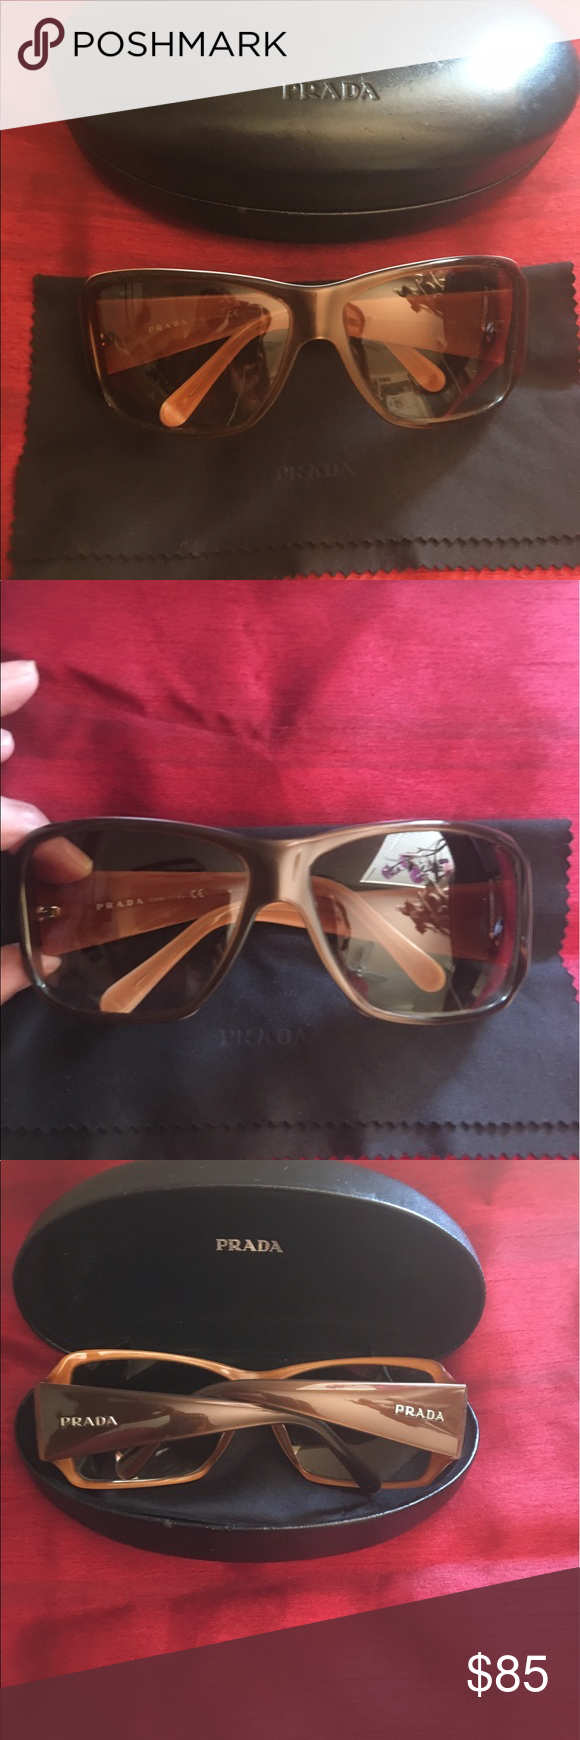 c13db96d337e ... gradient lens. boxed 6b203 a5f16  where can i buy prada vintage sunglasses  prada sunglasses logos on the sides and has a